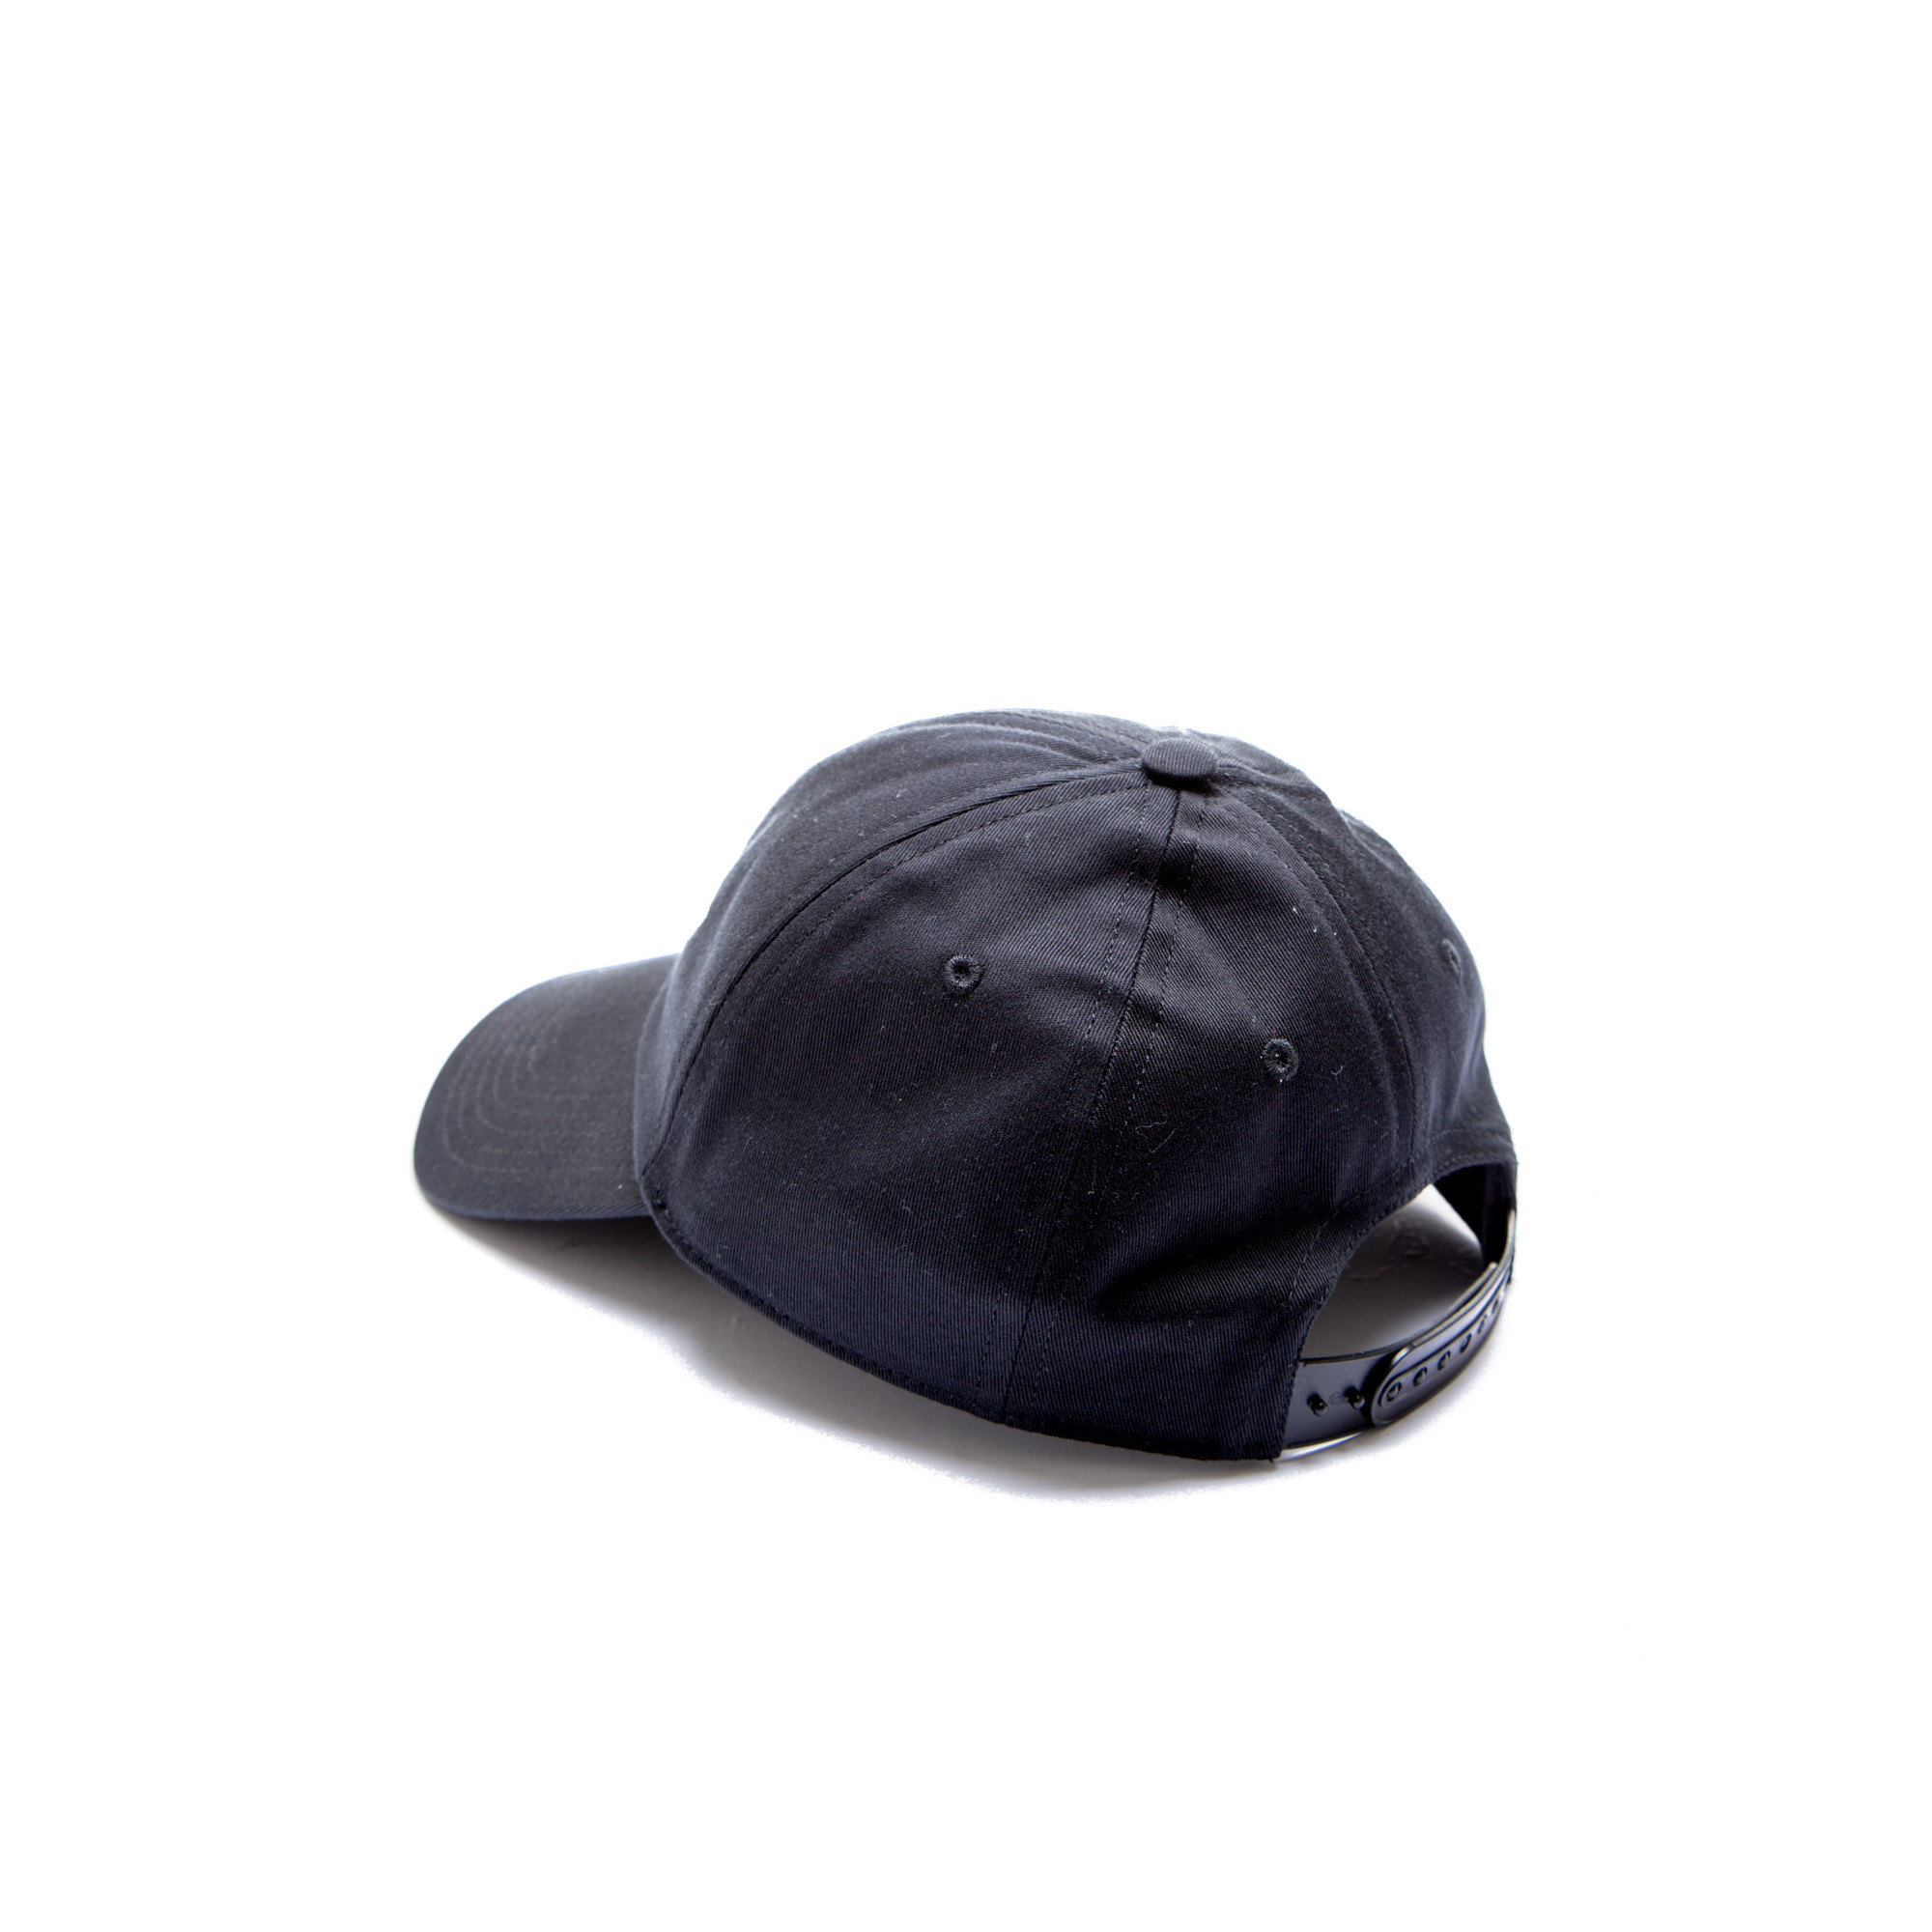 e48b6cf965032 ... Burberry casual baseball cap zwart